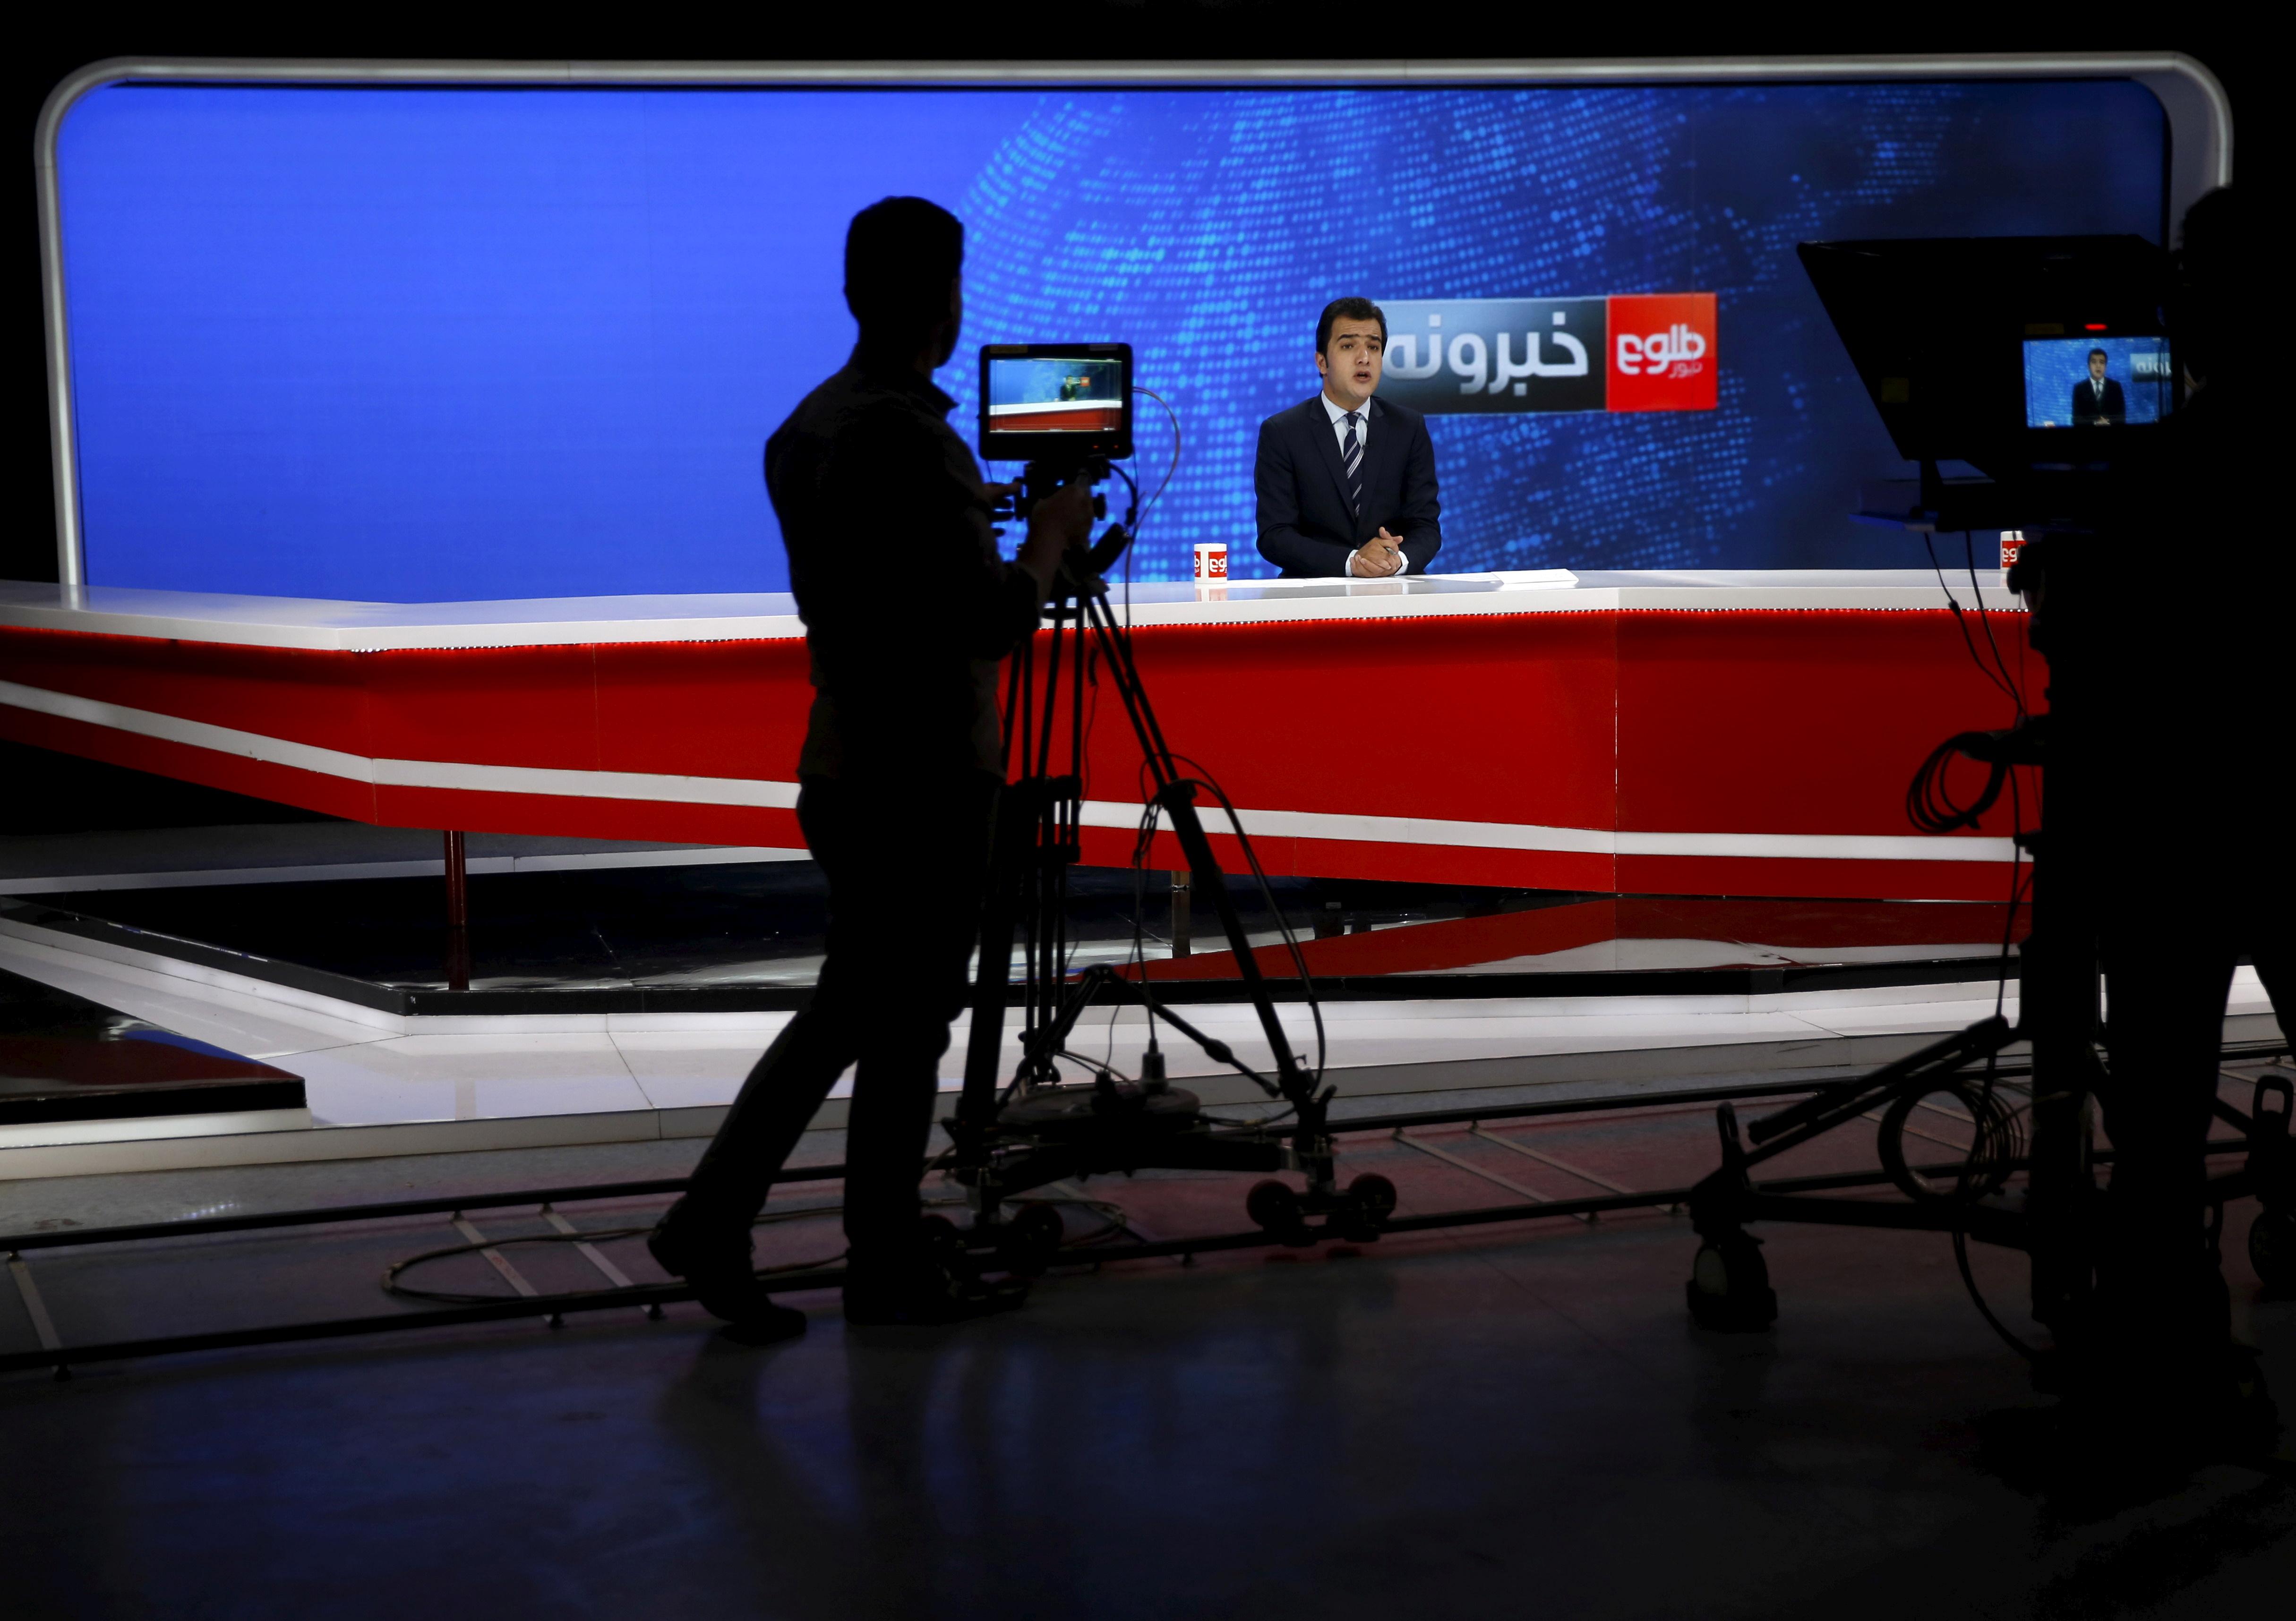 A cameraman films a news anchor at Tolo News studio, in Kabul, Afghanistan October 18, 2015. REUTERS/Ahmad Masood